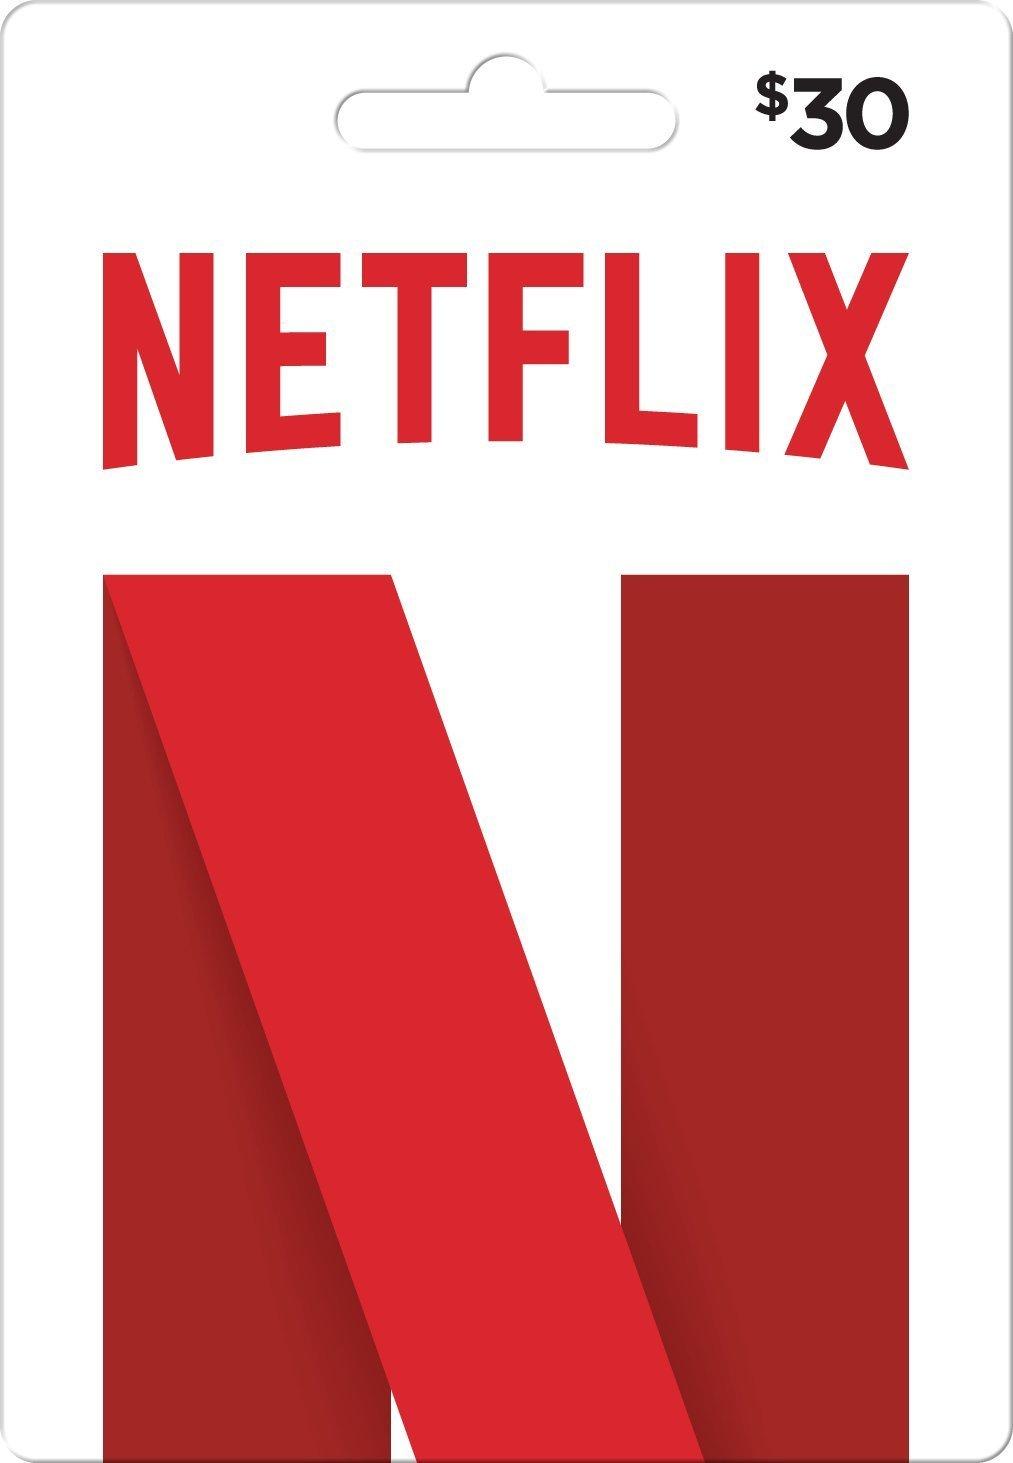 New mom gifts: Netflix gift card | Amazon